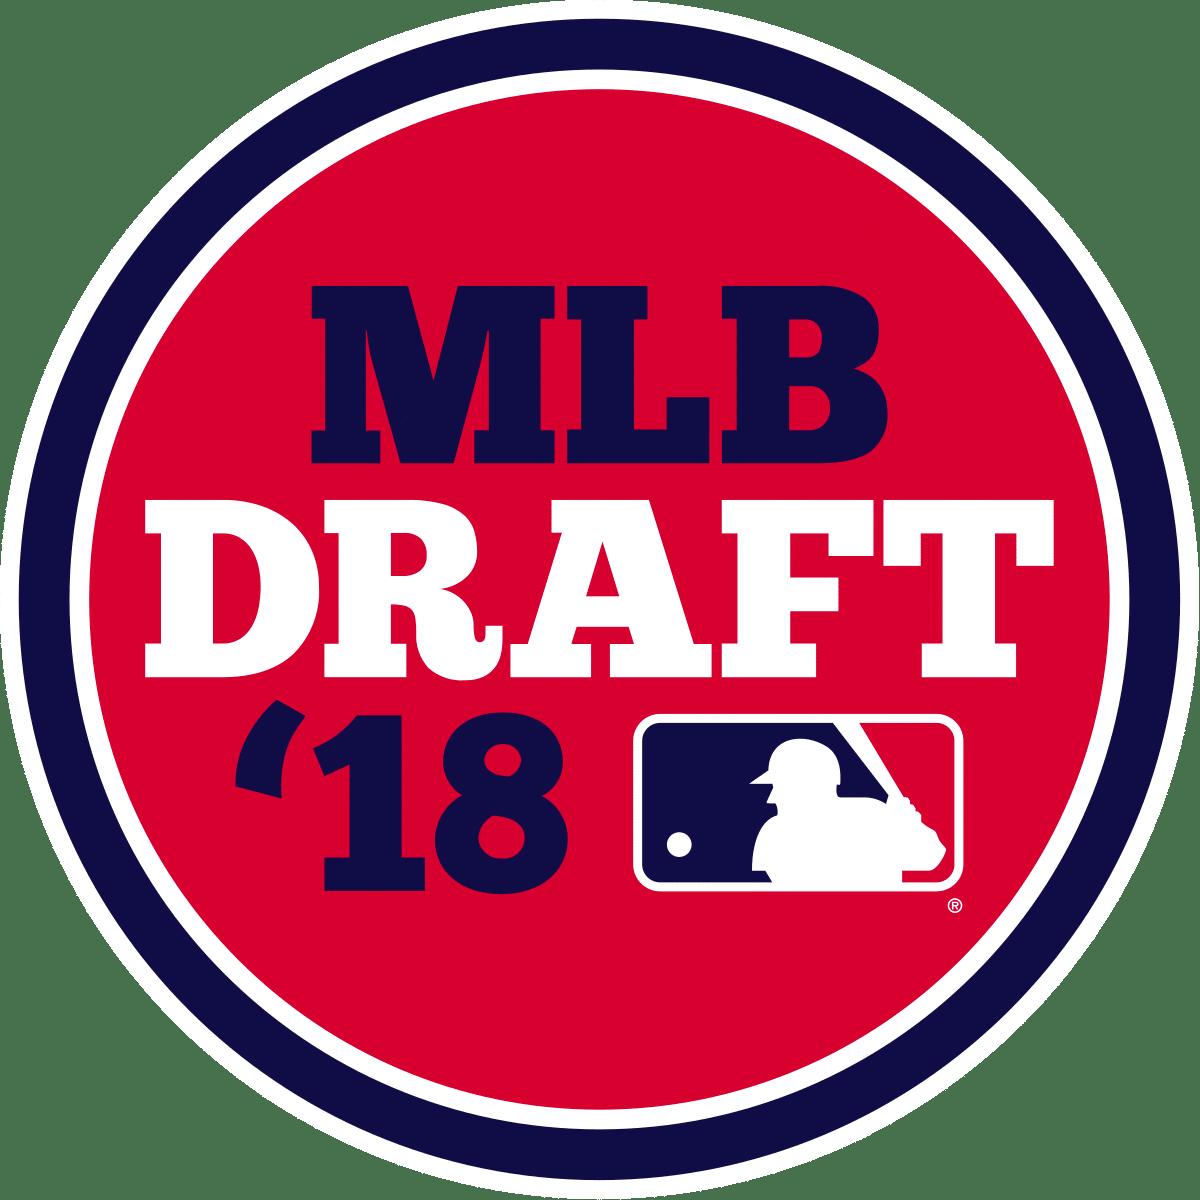 Mlb Draft Where Are The Top 10 2018 Picks Now Americanleague Nationalleague Major League Baseball Mlb Baseball